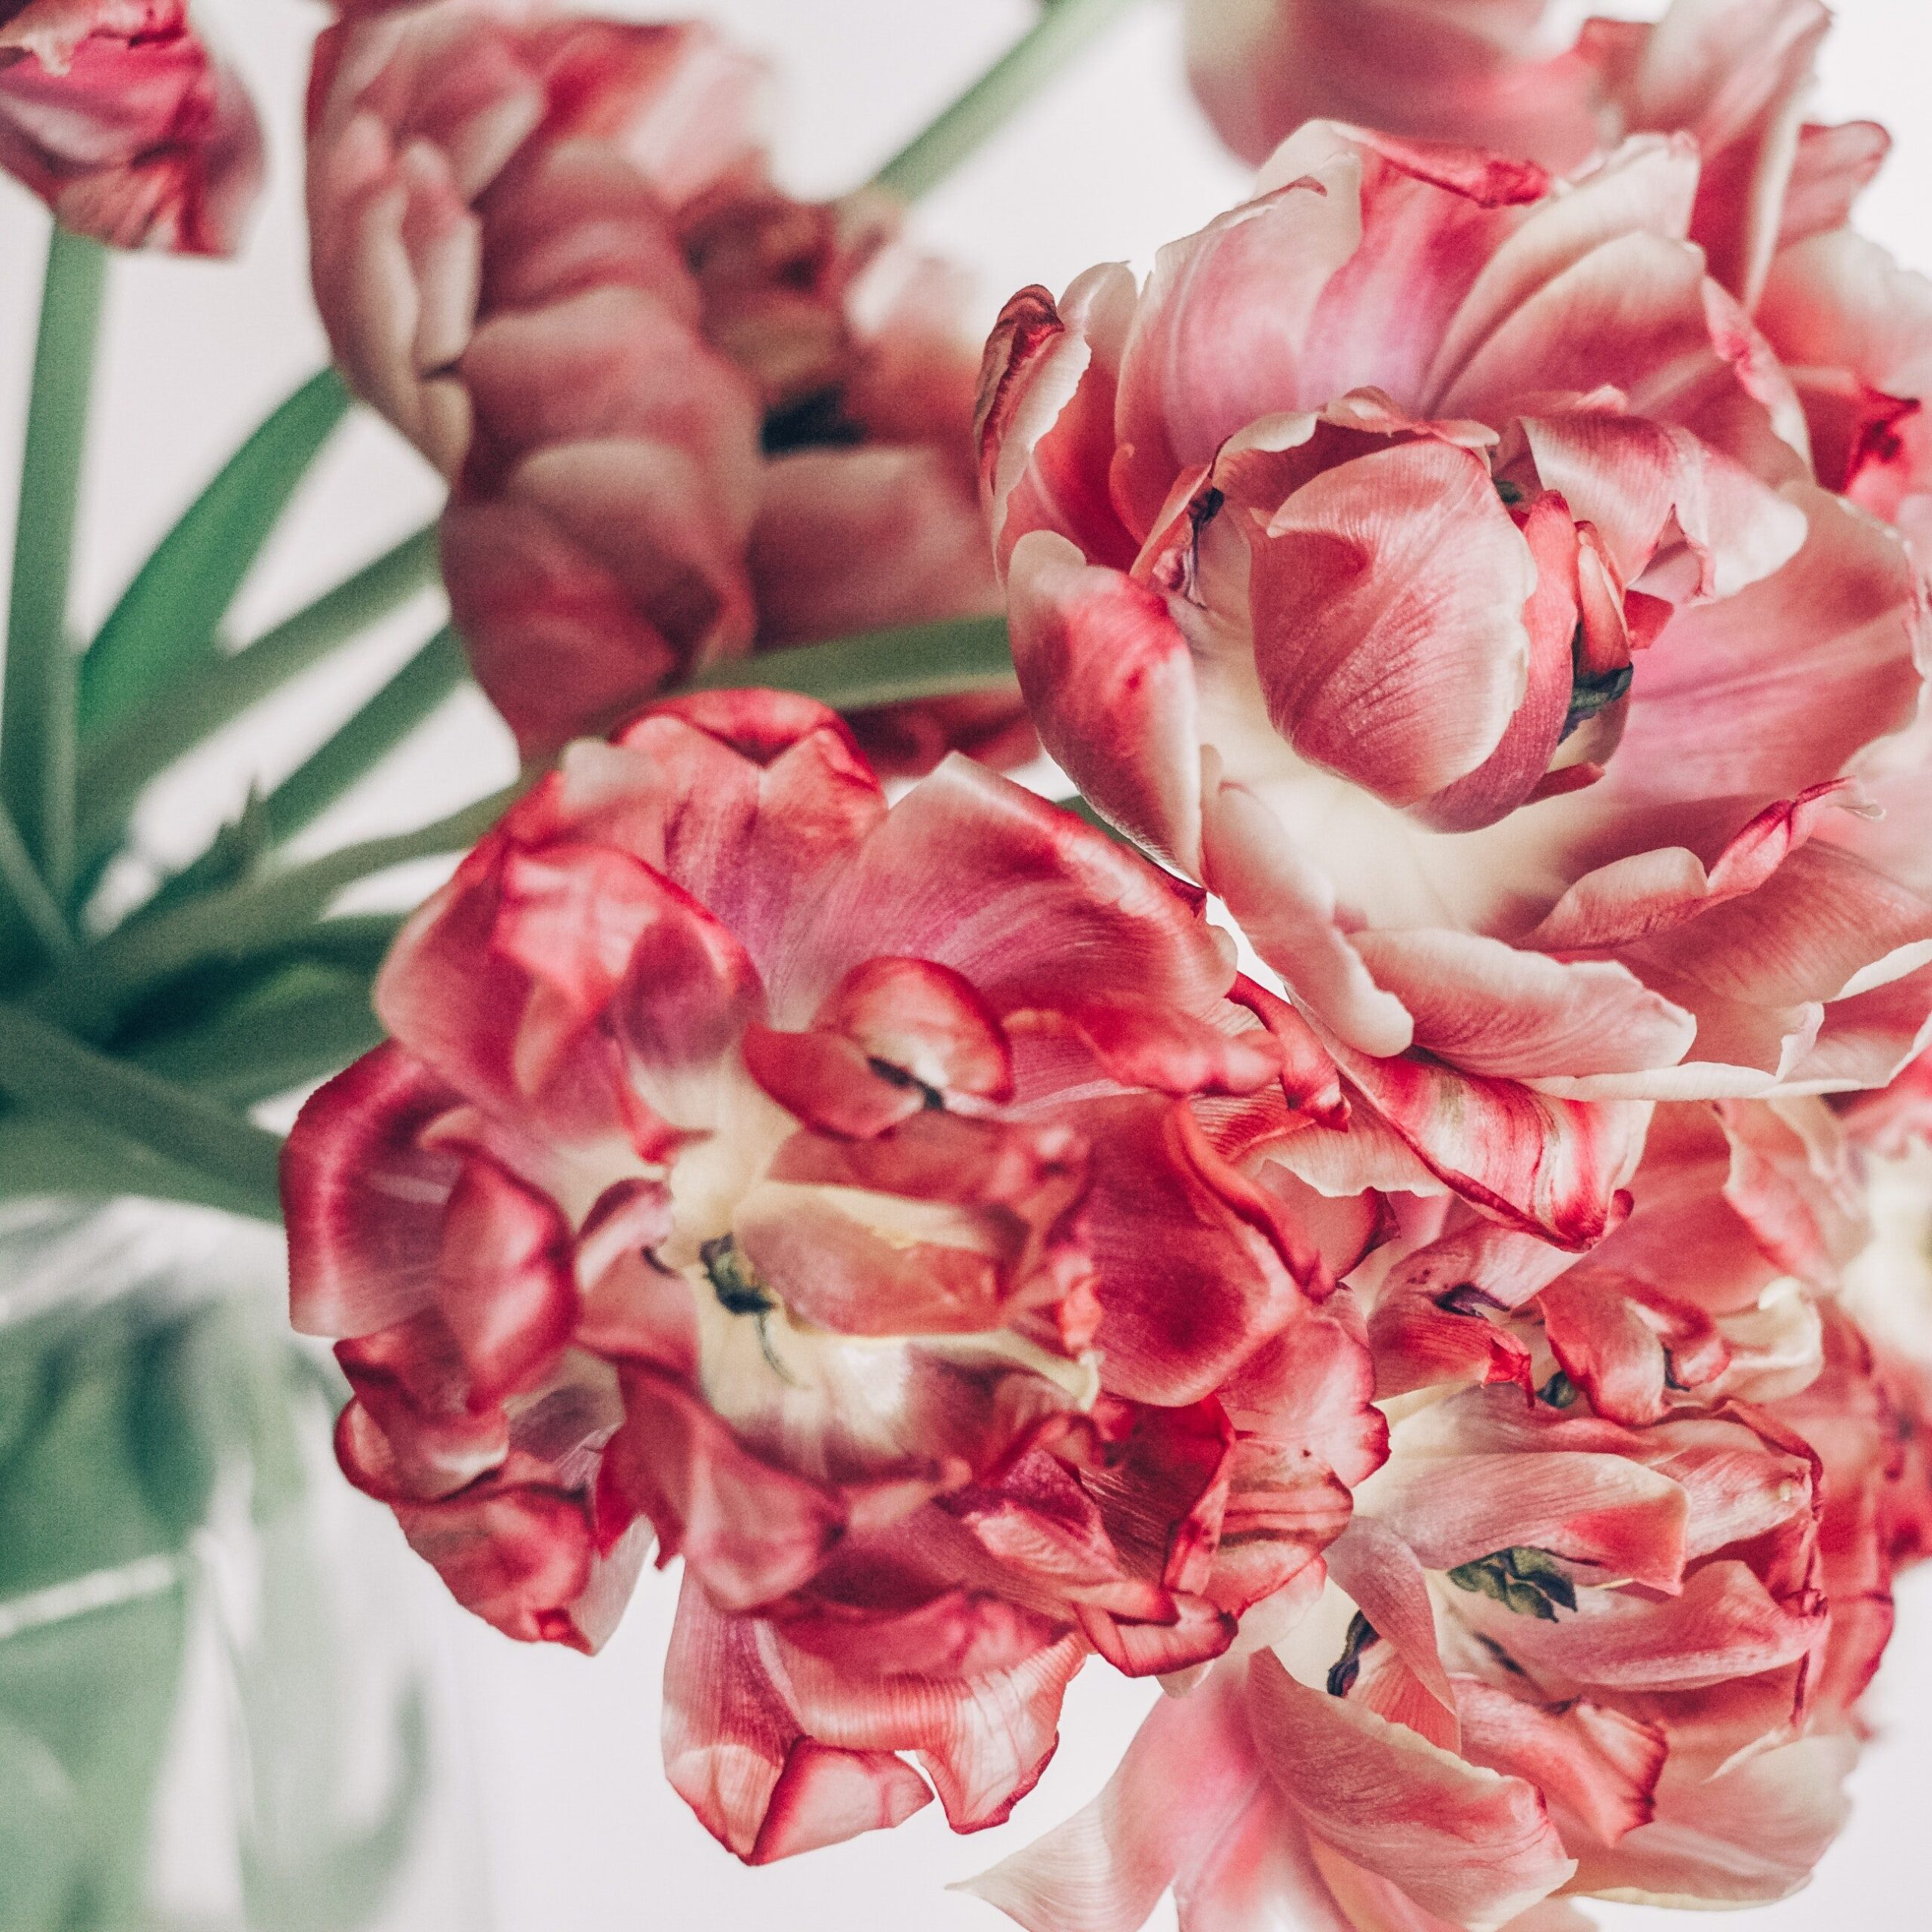 Tulipan doble. Imagen de Dina Nasyrova en Pexels